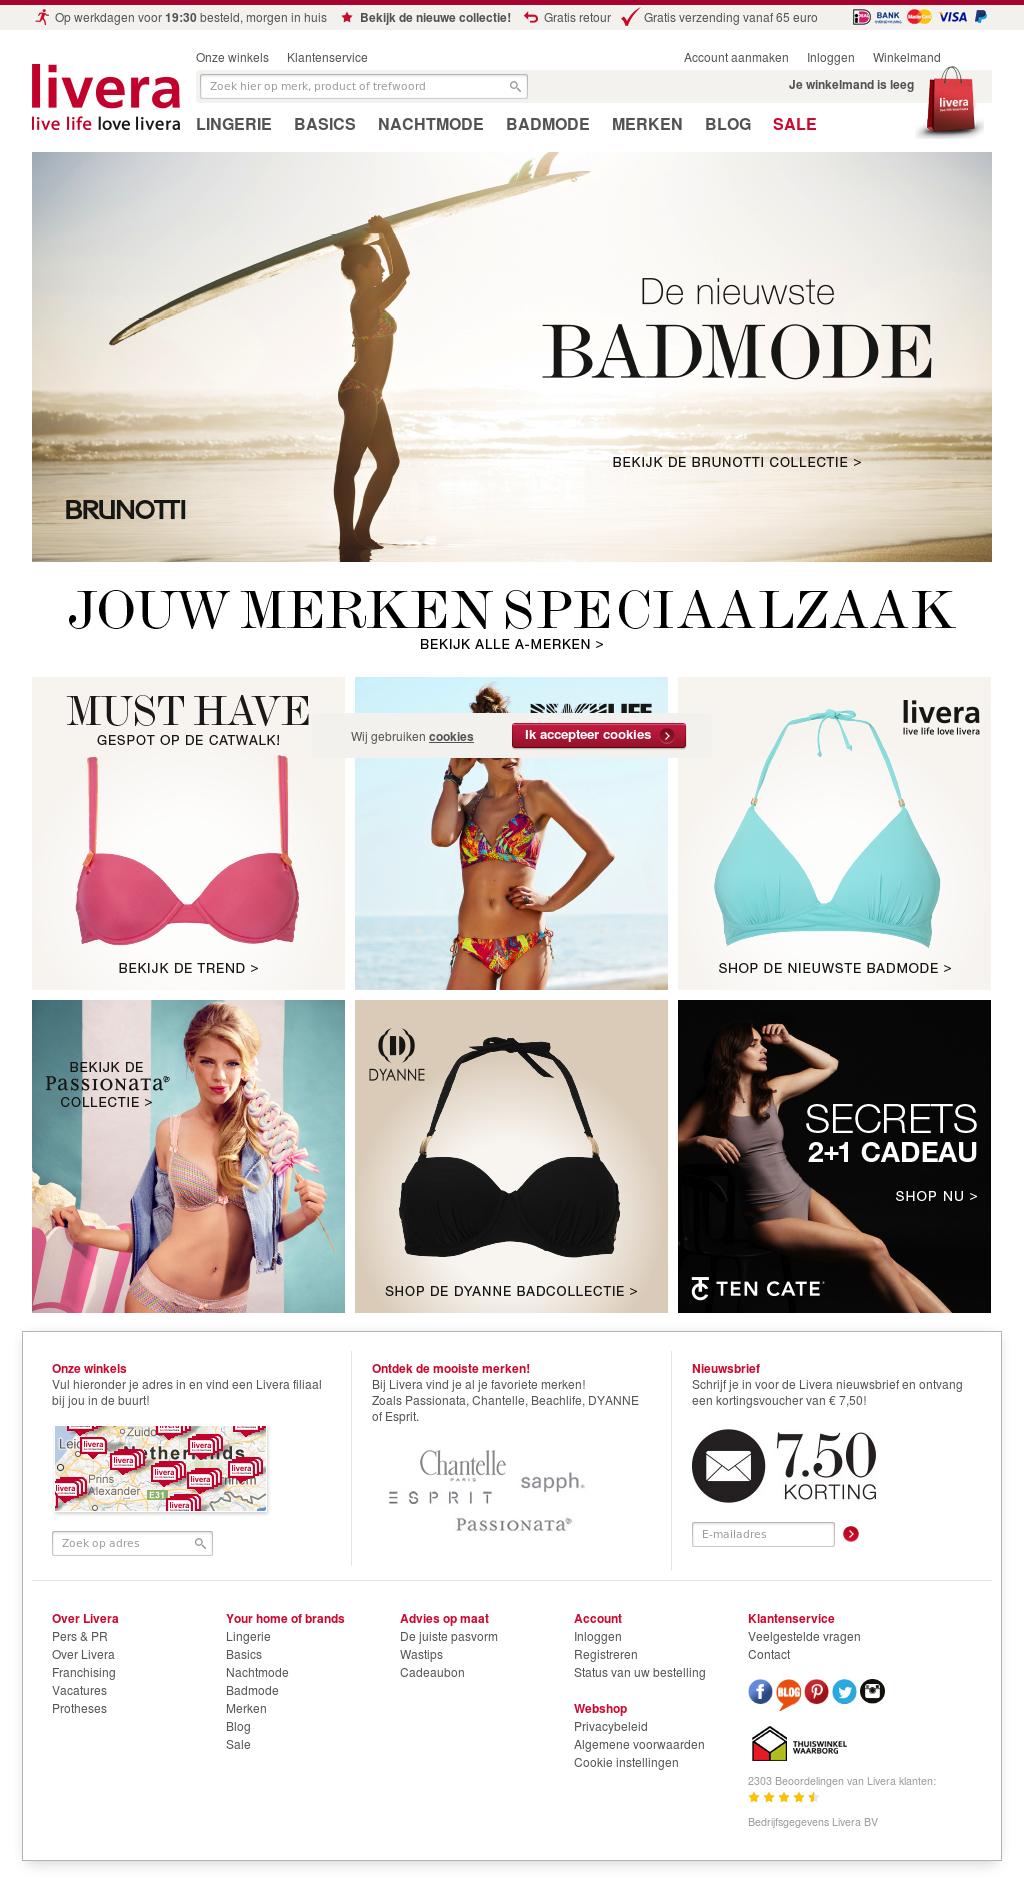 Livera bikini online dating